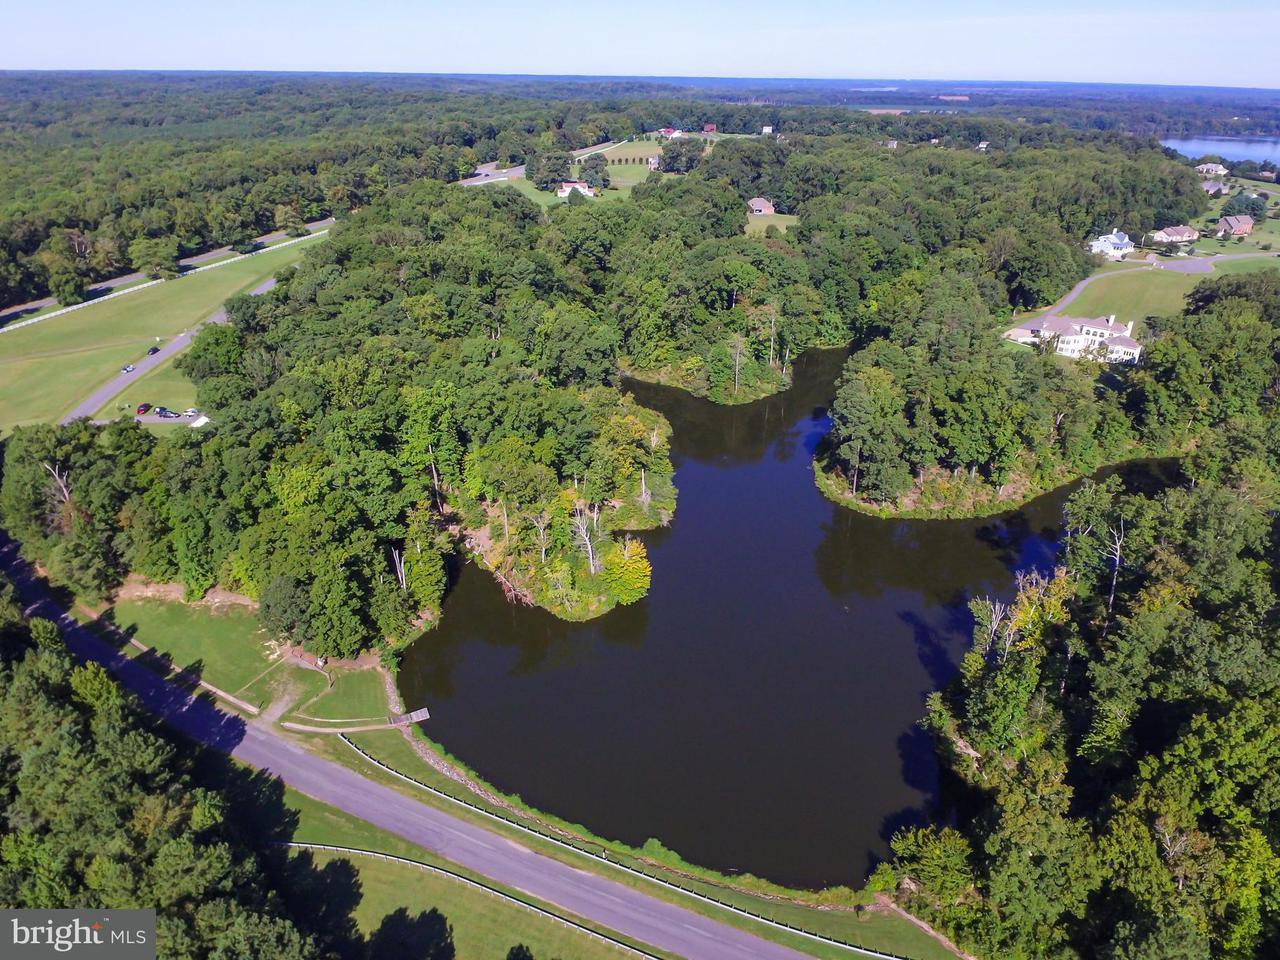 Land for Sale at Lot 81 - Portobago Trl Port Royal, Virginia 22535 United States